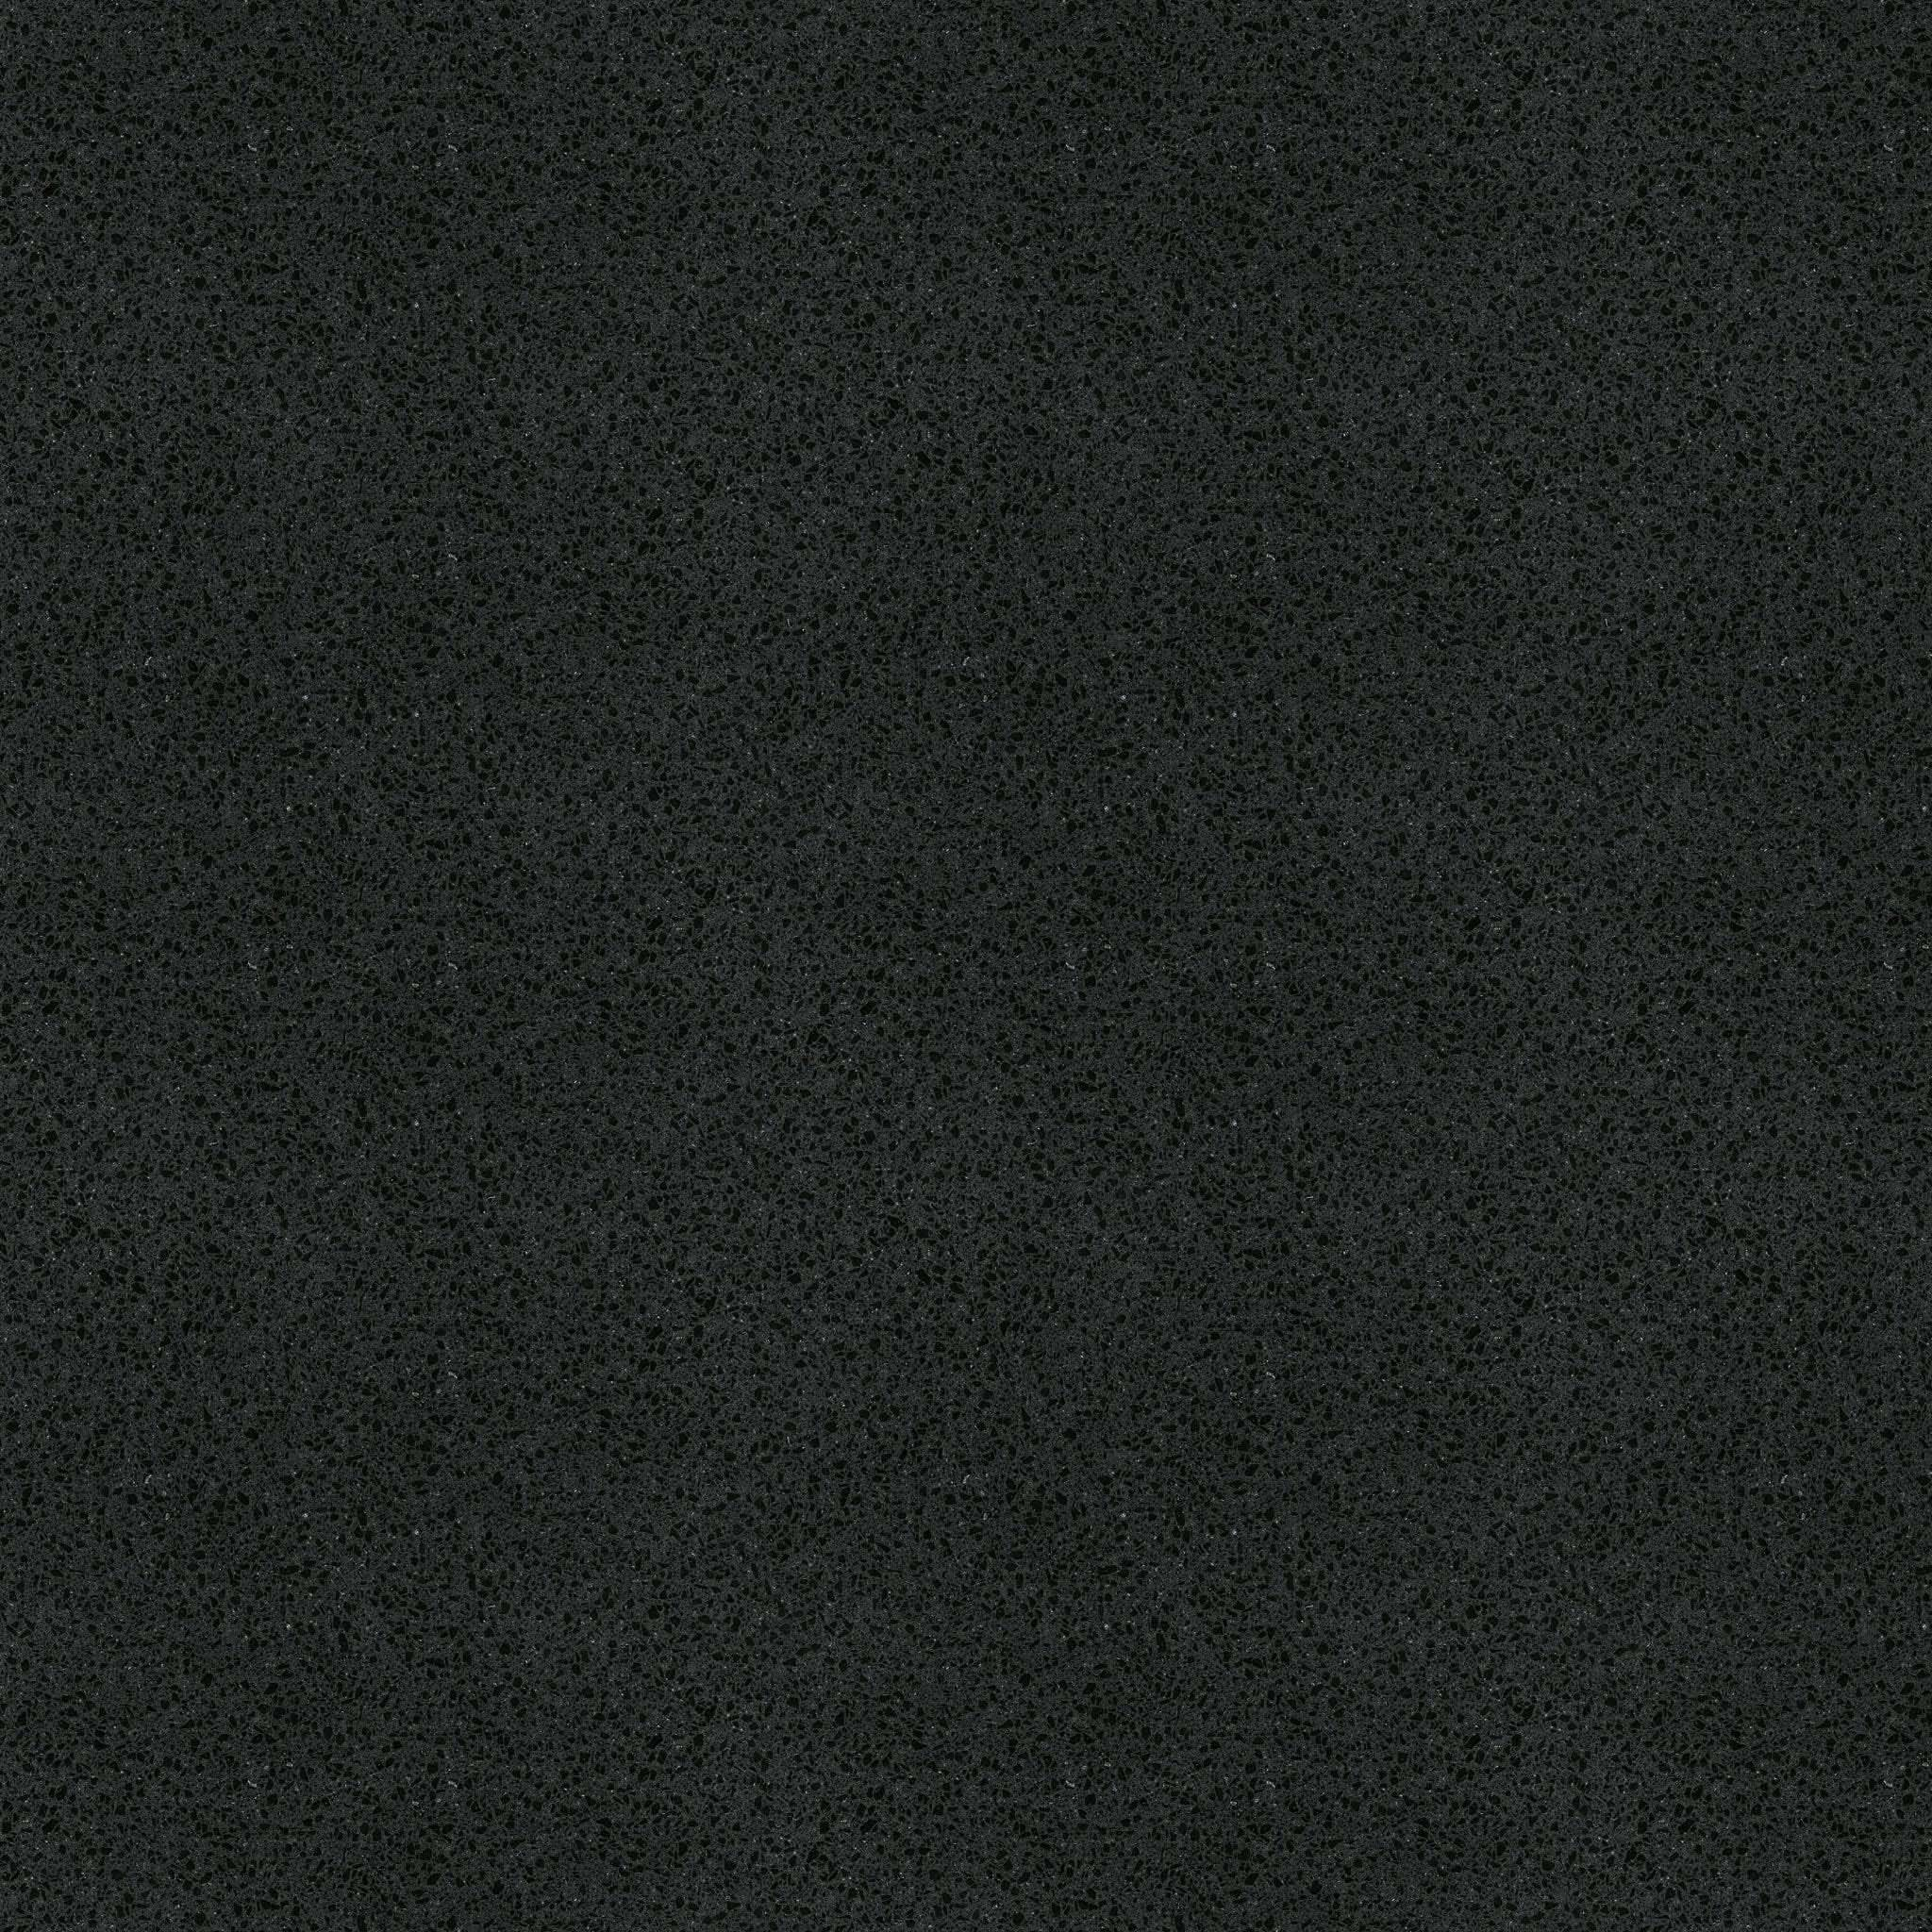 Ref 646 Black Diamond